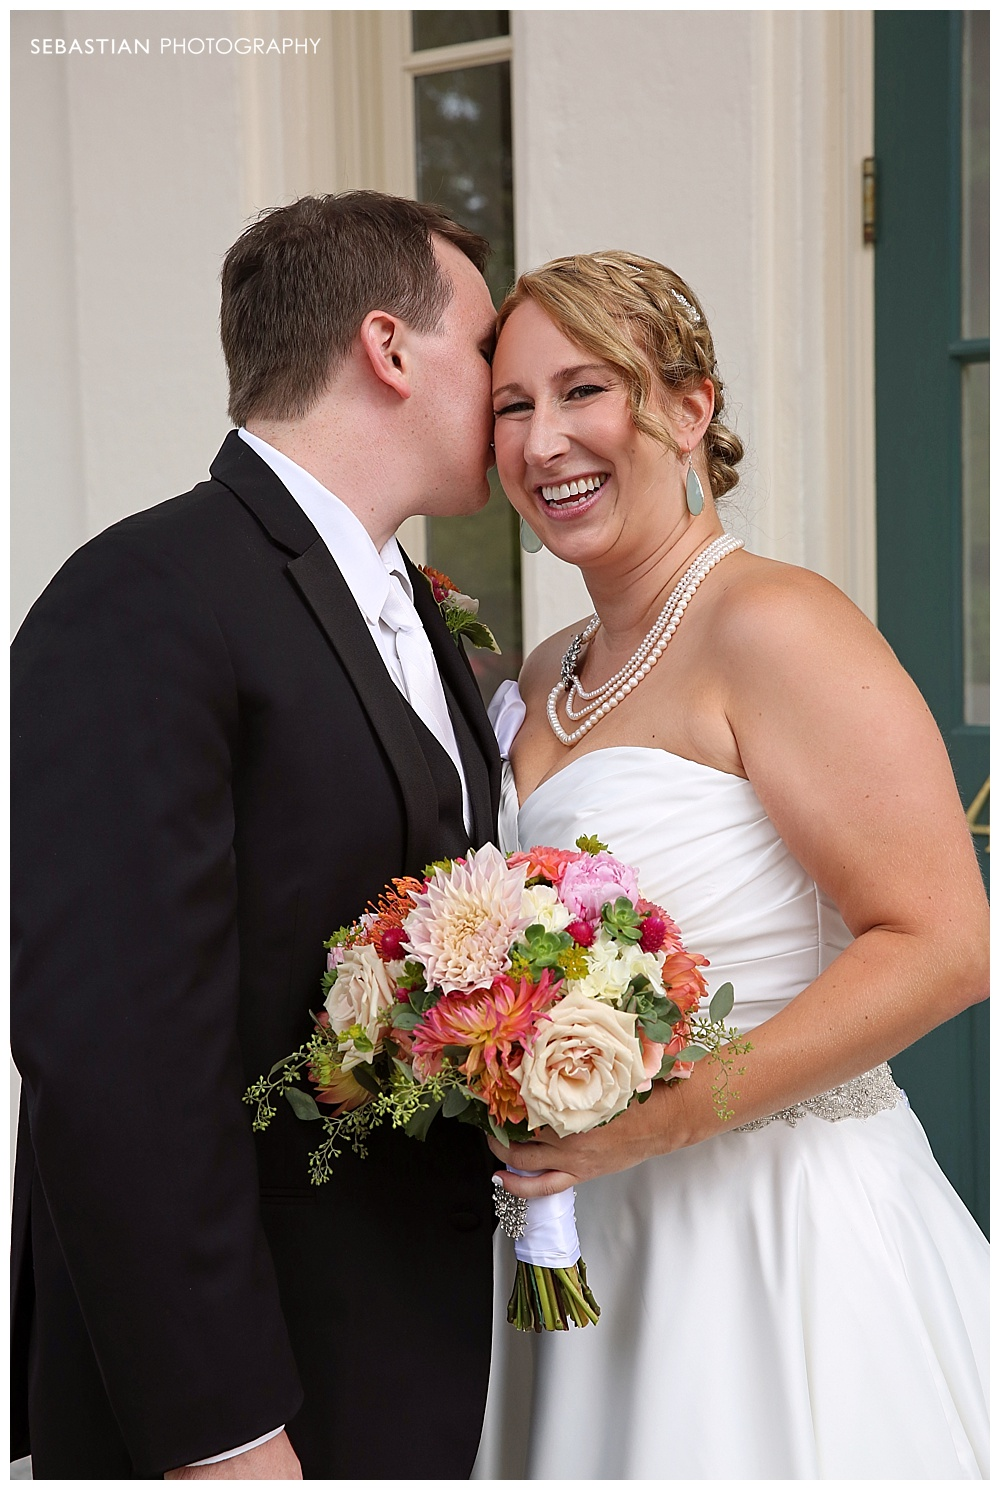 Sebastian_Photography_Wadsworth_Mansion_Wedding_Pictures_CT_24.jpg